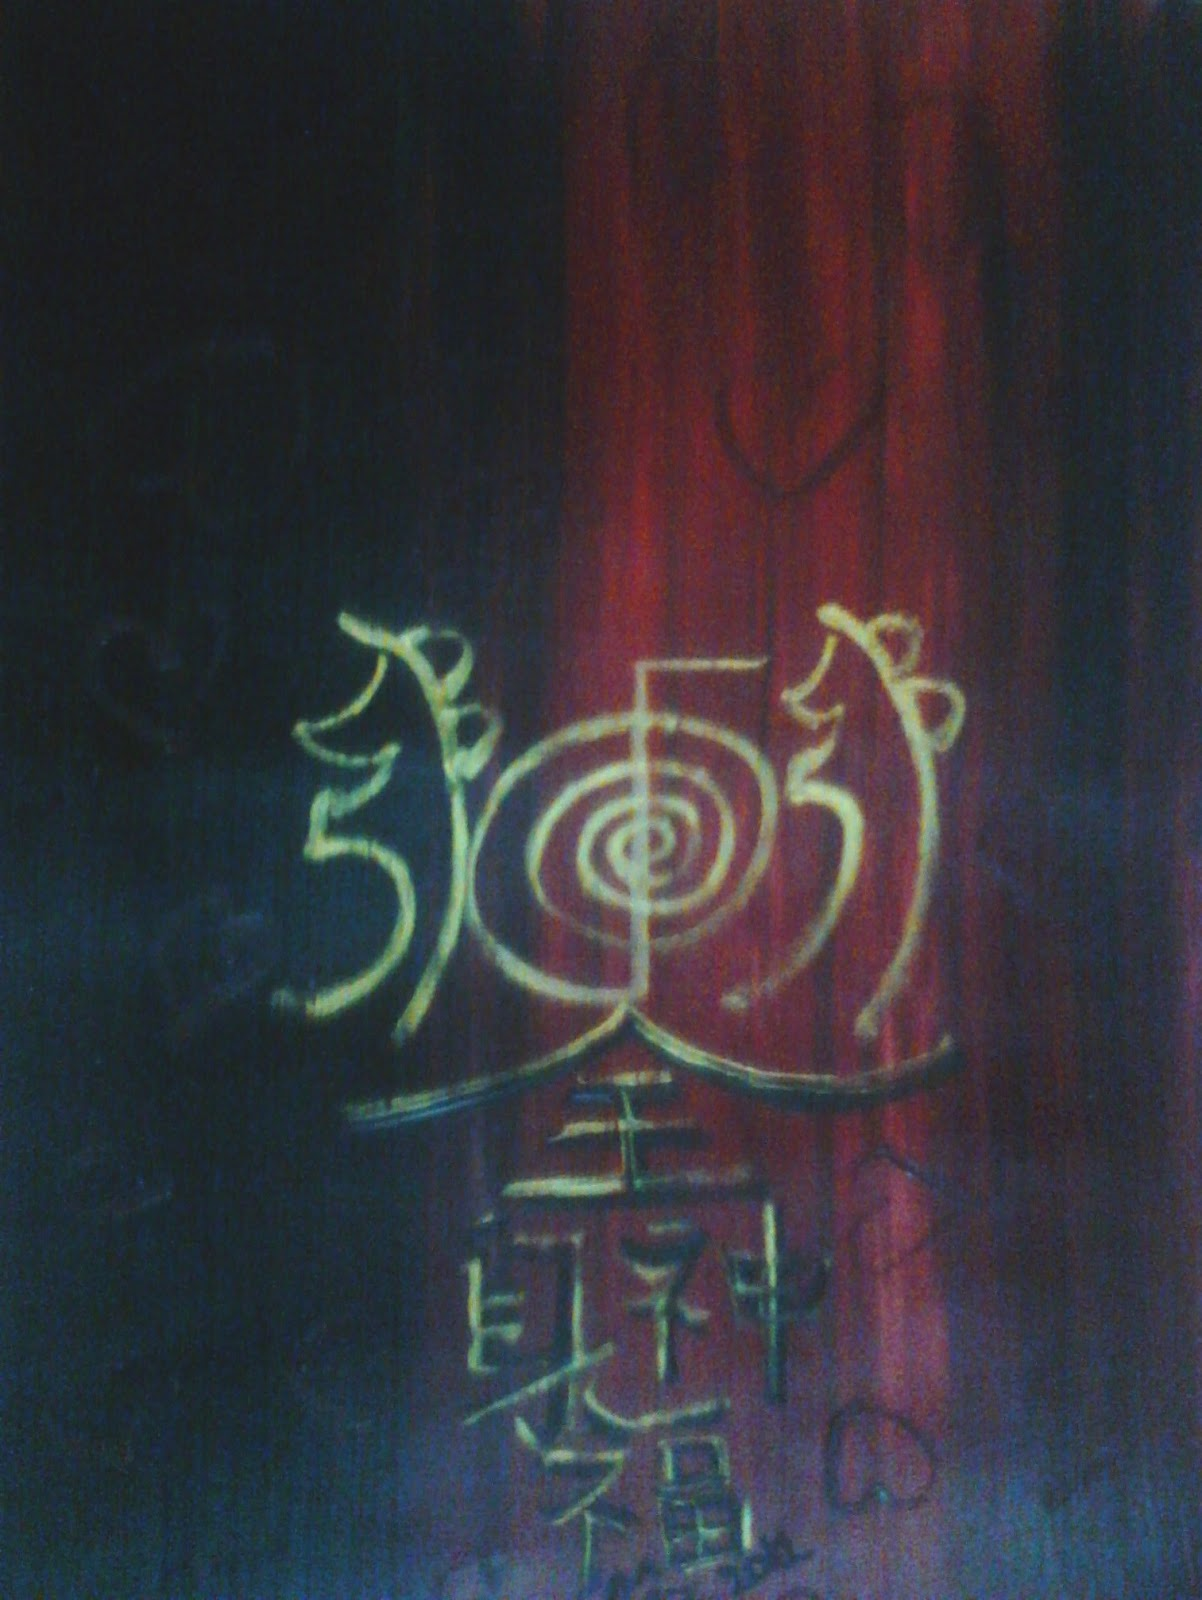 Razarts Reiki Symbol Se He Ki Meaning And Feng Shui Energy